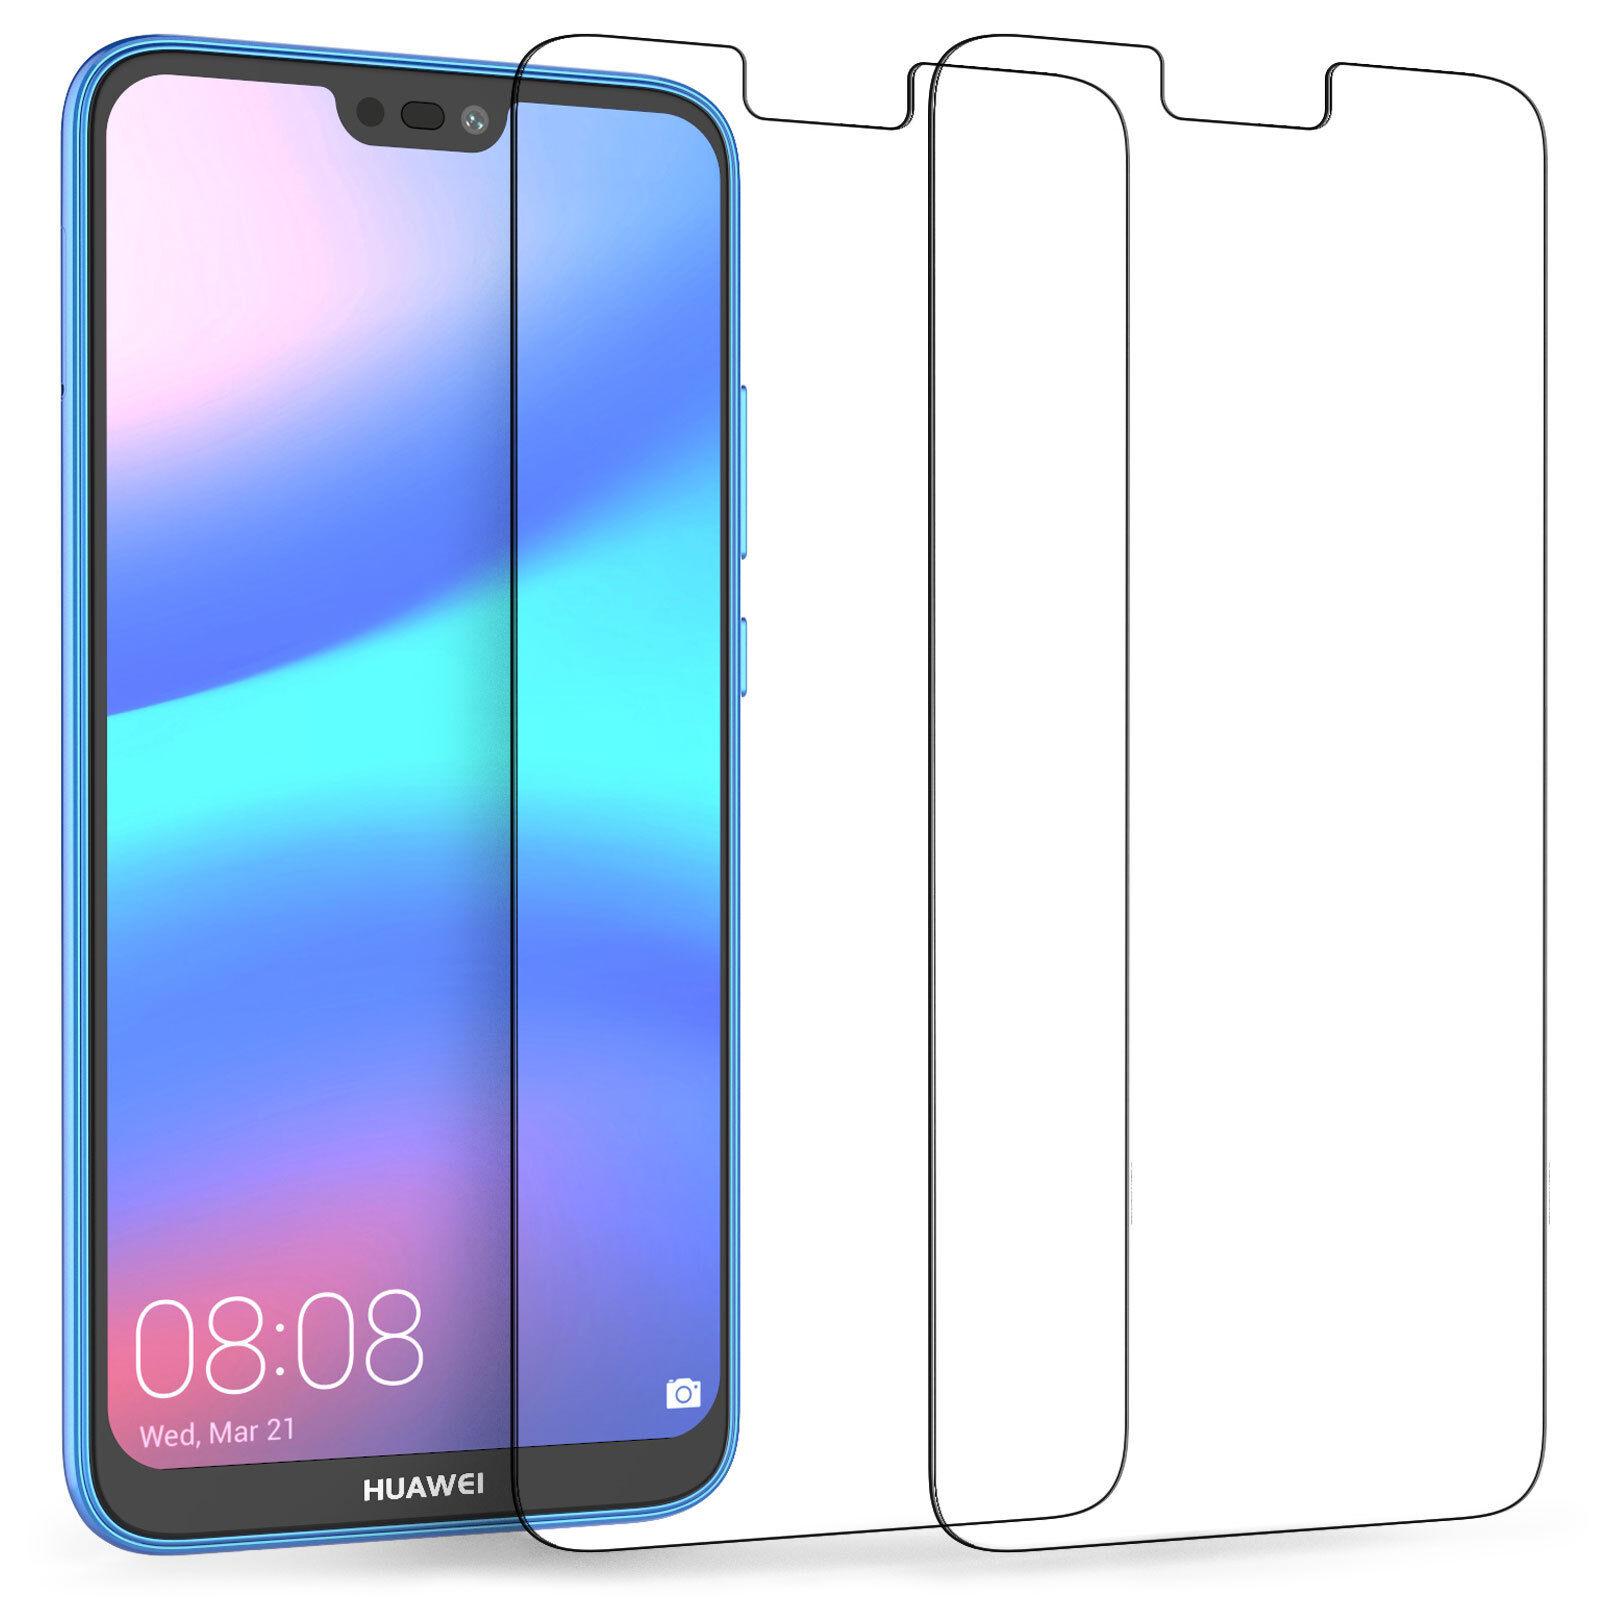 Black Color : Black GzPuluz Glass Protector Film 25 PCS Full Screen Full Glue Anti-Fingerprint Tempered Glass Film for Huawei Mate 20 Lite